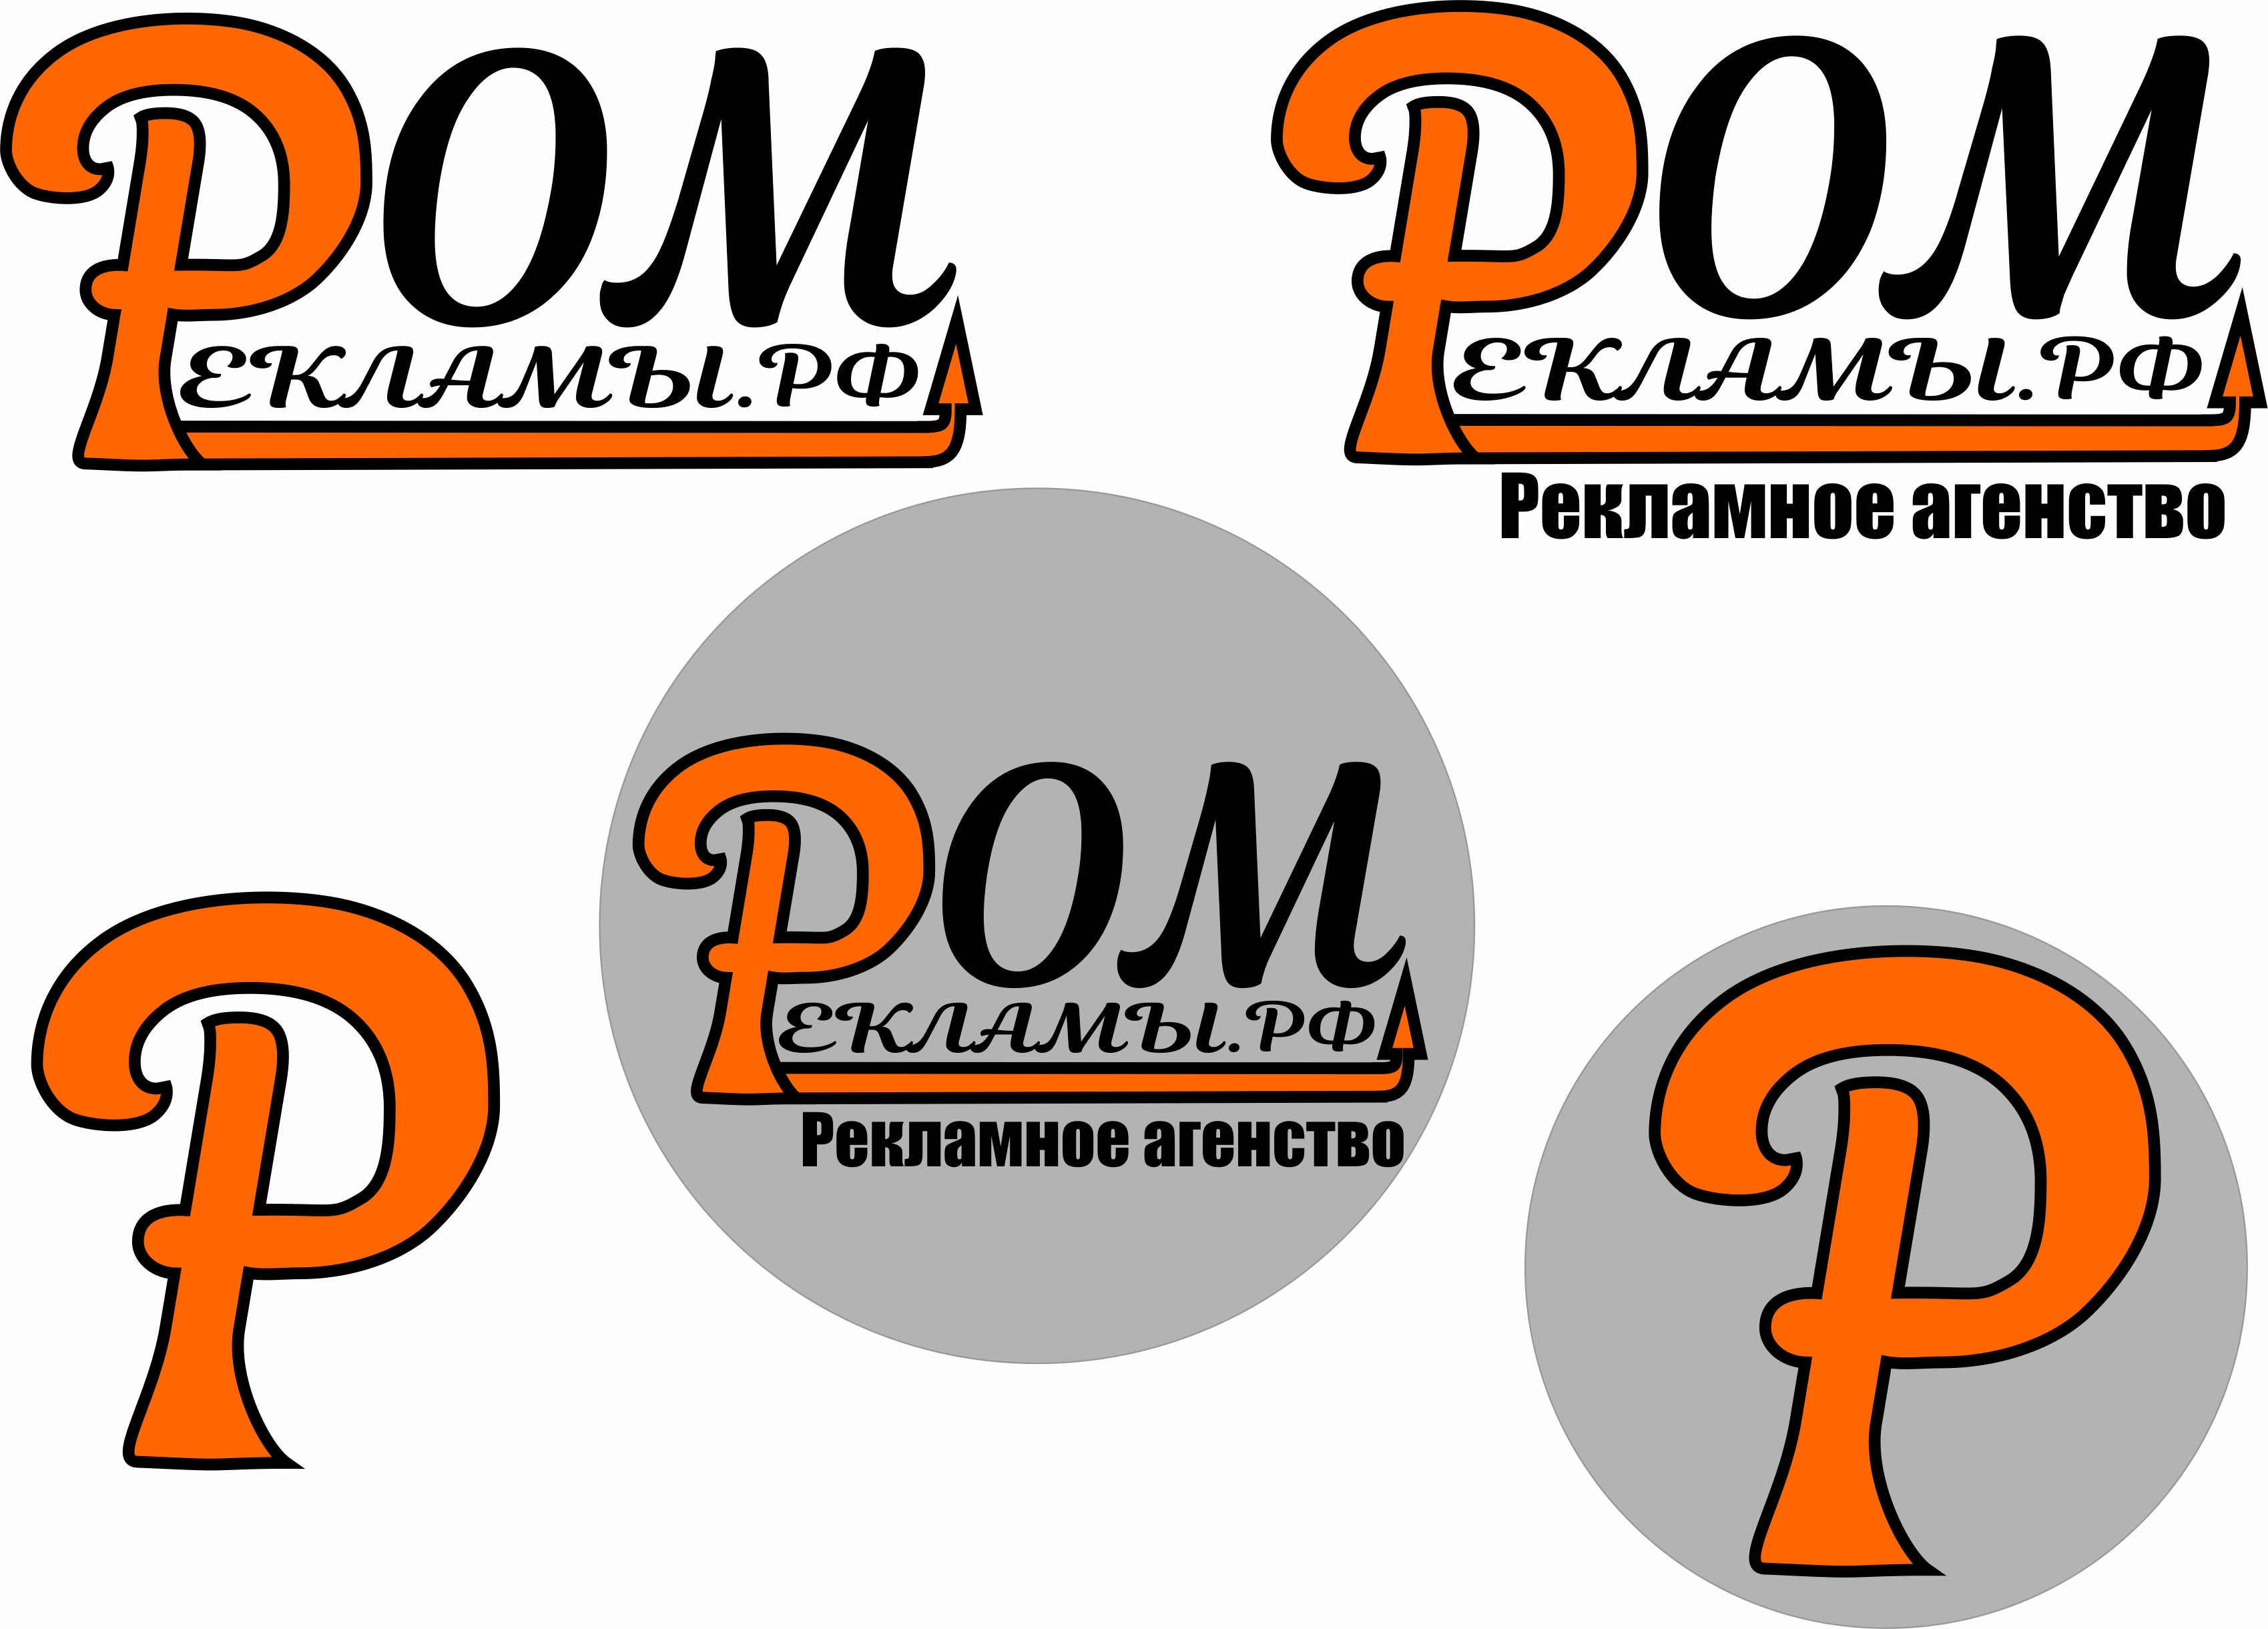 Дизайн логотипа рекламно-производственной компании фото f_8405edca55b69738.jpg